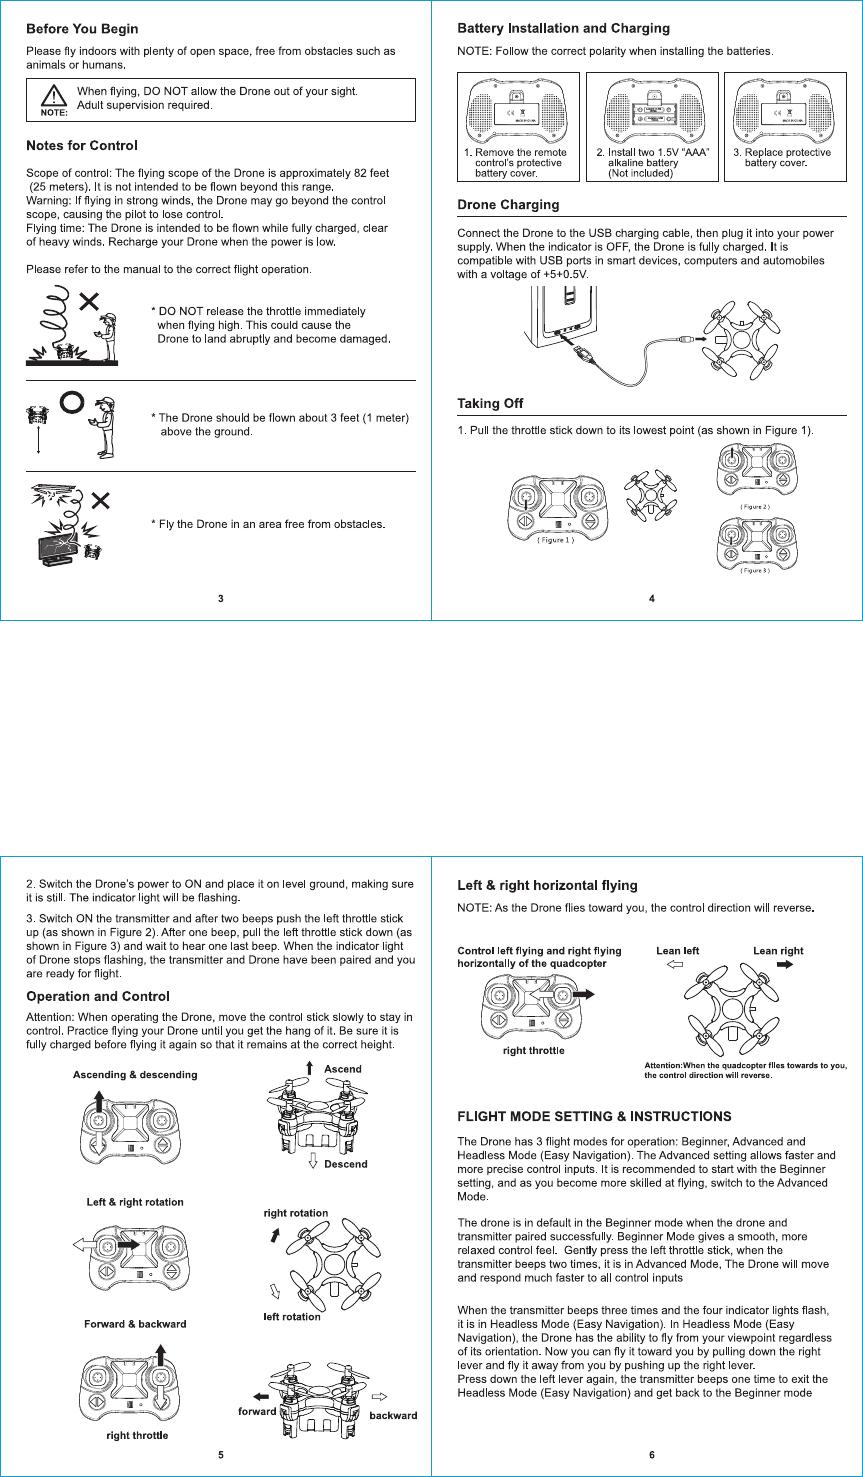 Weccan WECCAN-DRONE 2 4G 4ch RC Drone User Manual US F16 FL